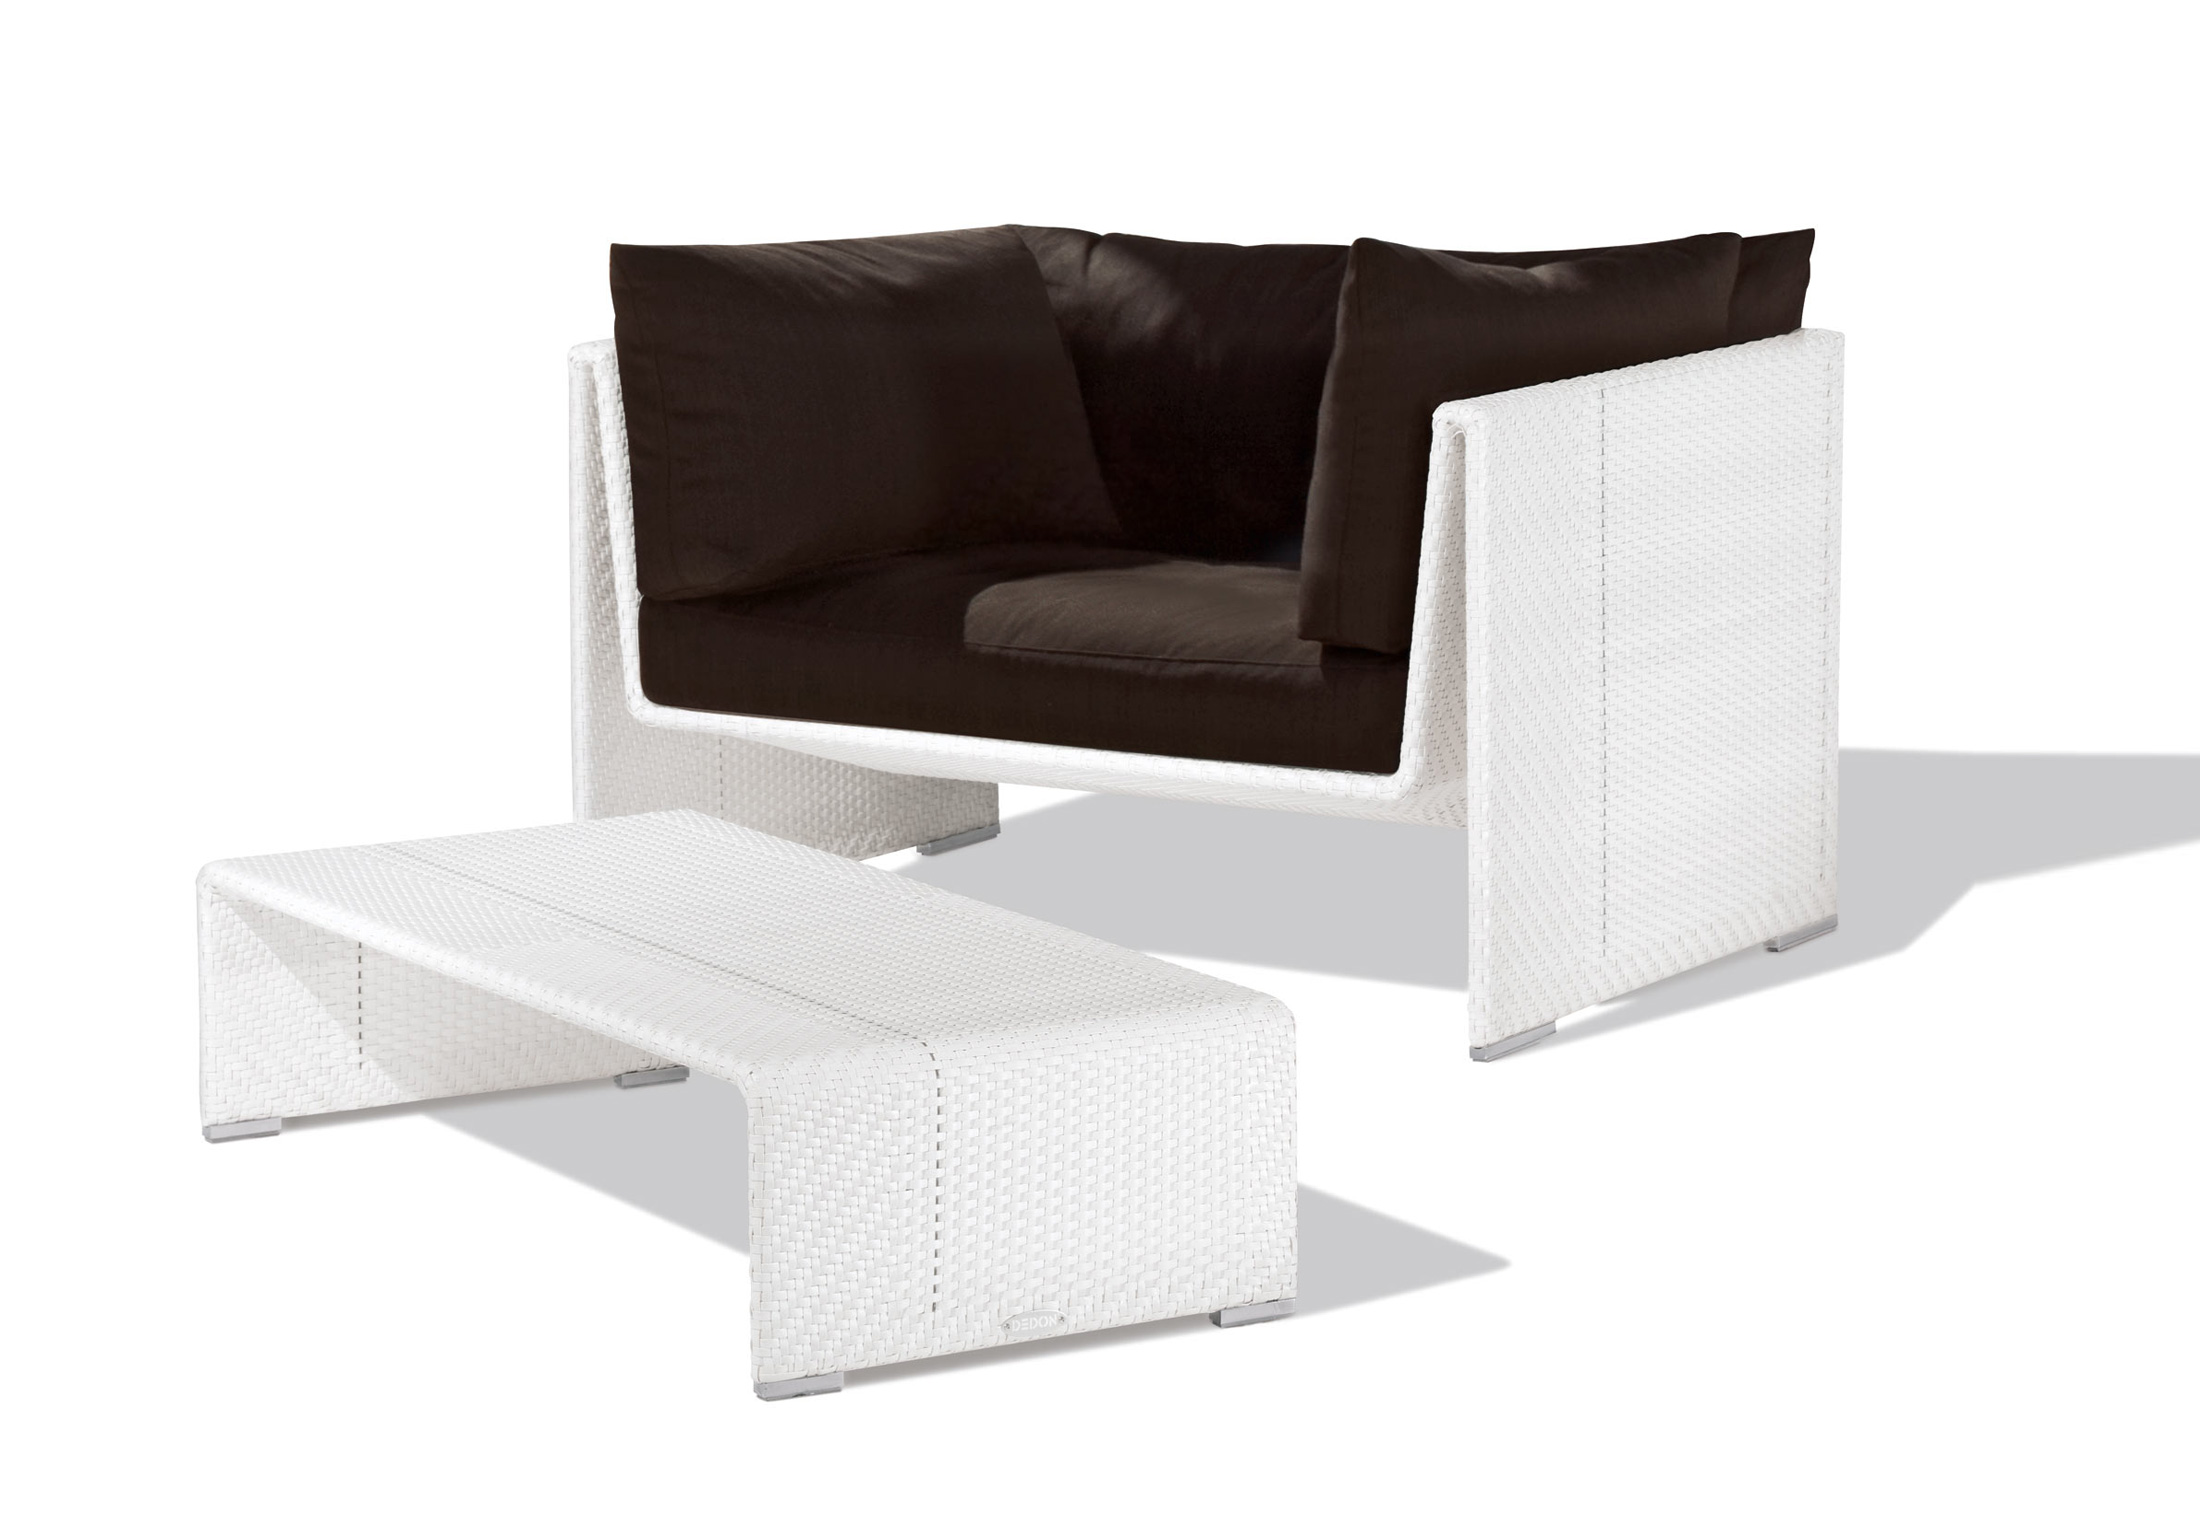 Superb Slime Line Lounge Chair By Dedon Stylepark Machost Co Dining Chair Design Ideas Machostcouk